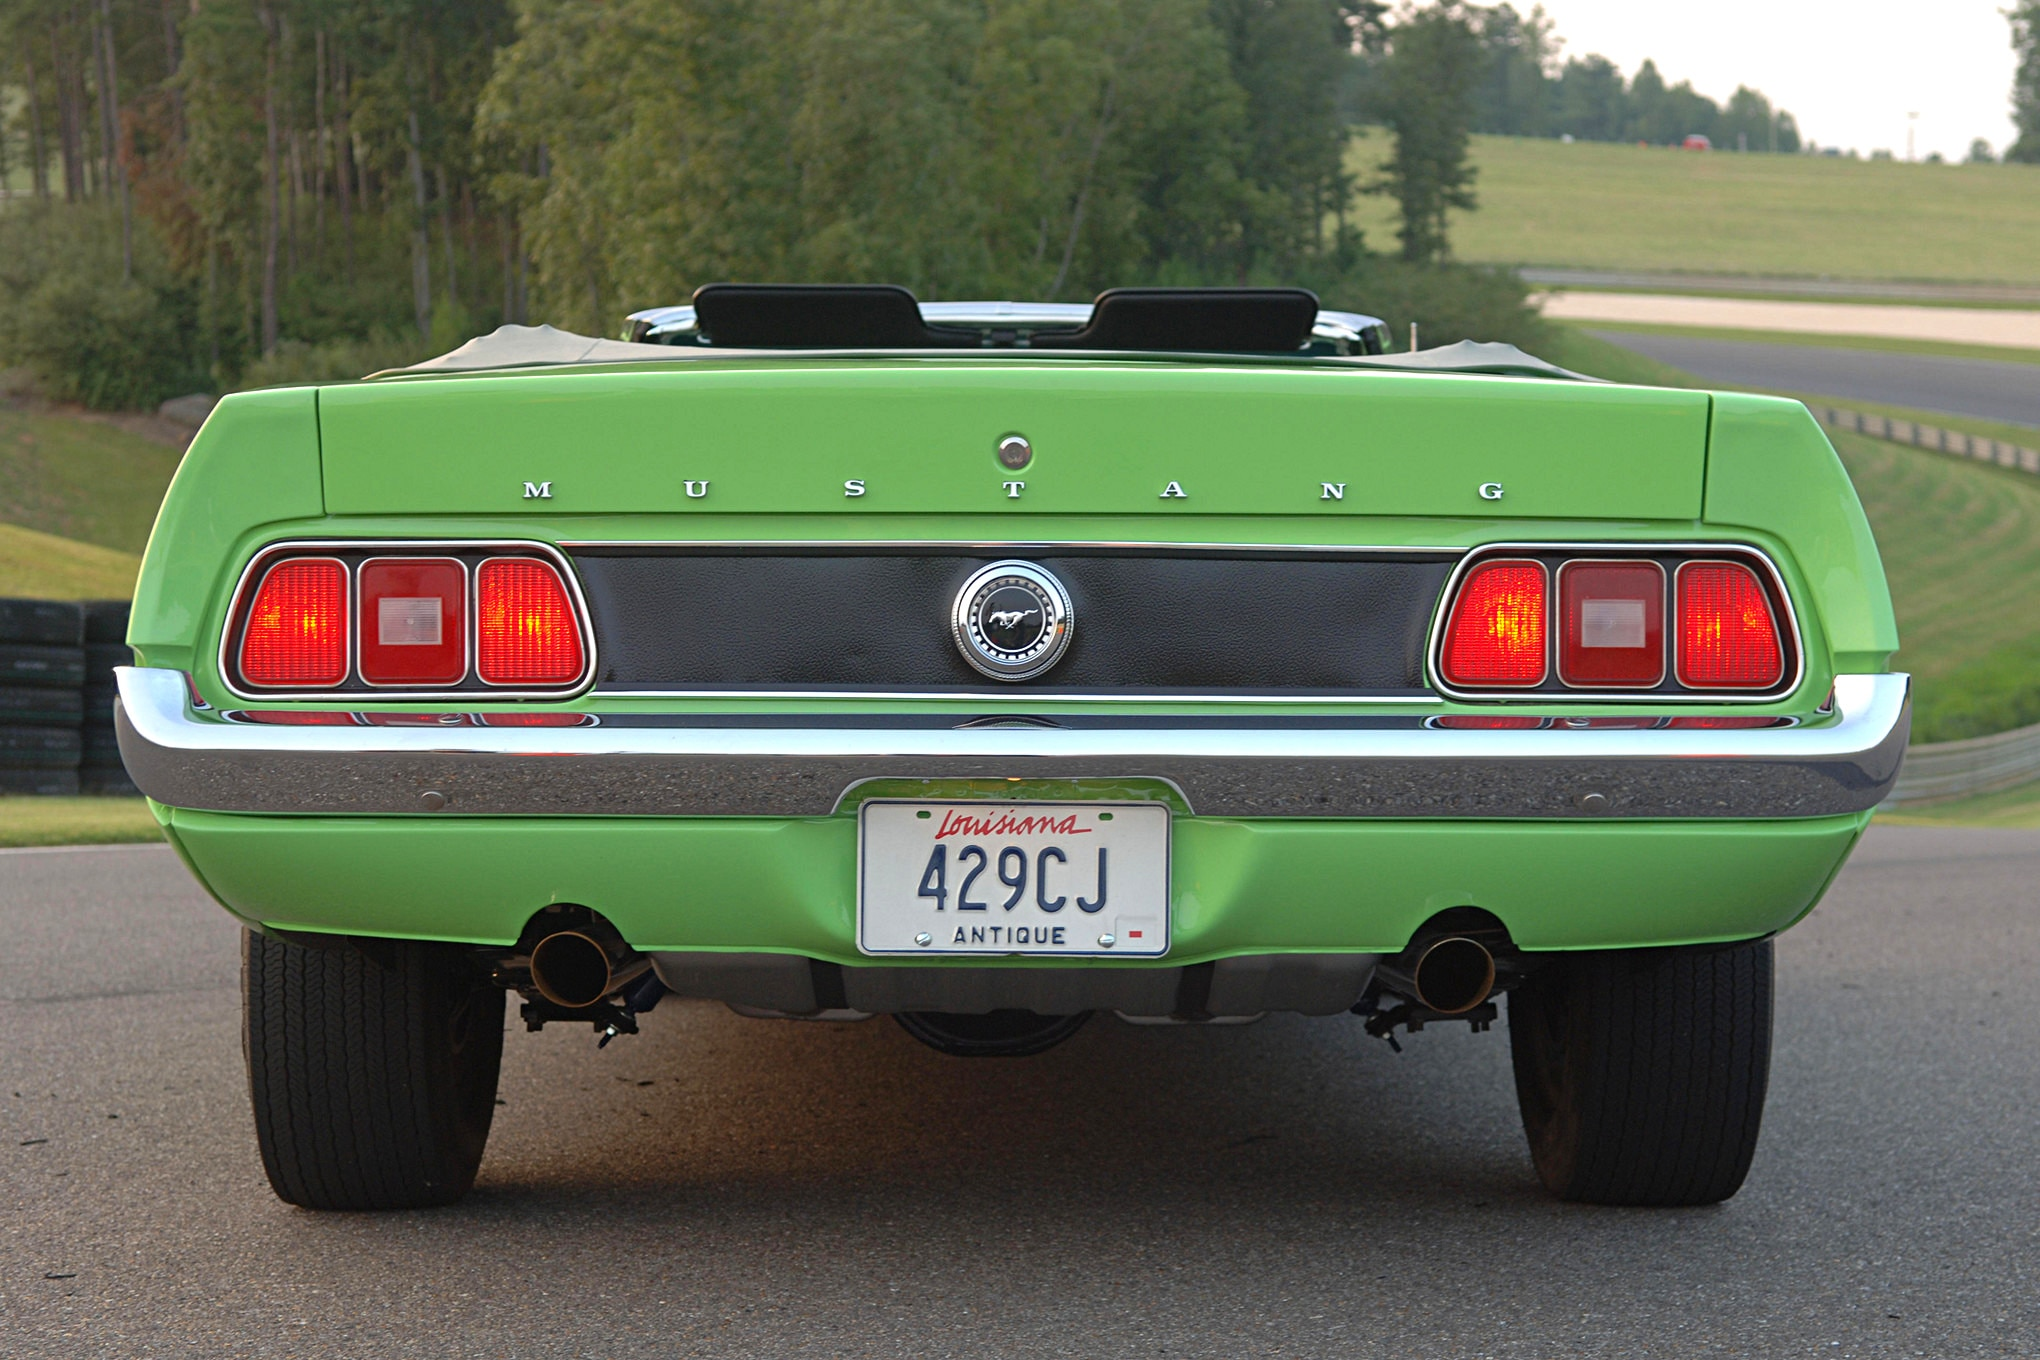 015 1971 73 Mustang SpottersGuide Heasley